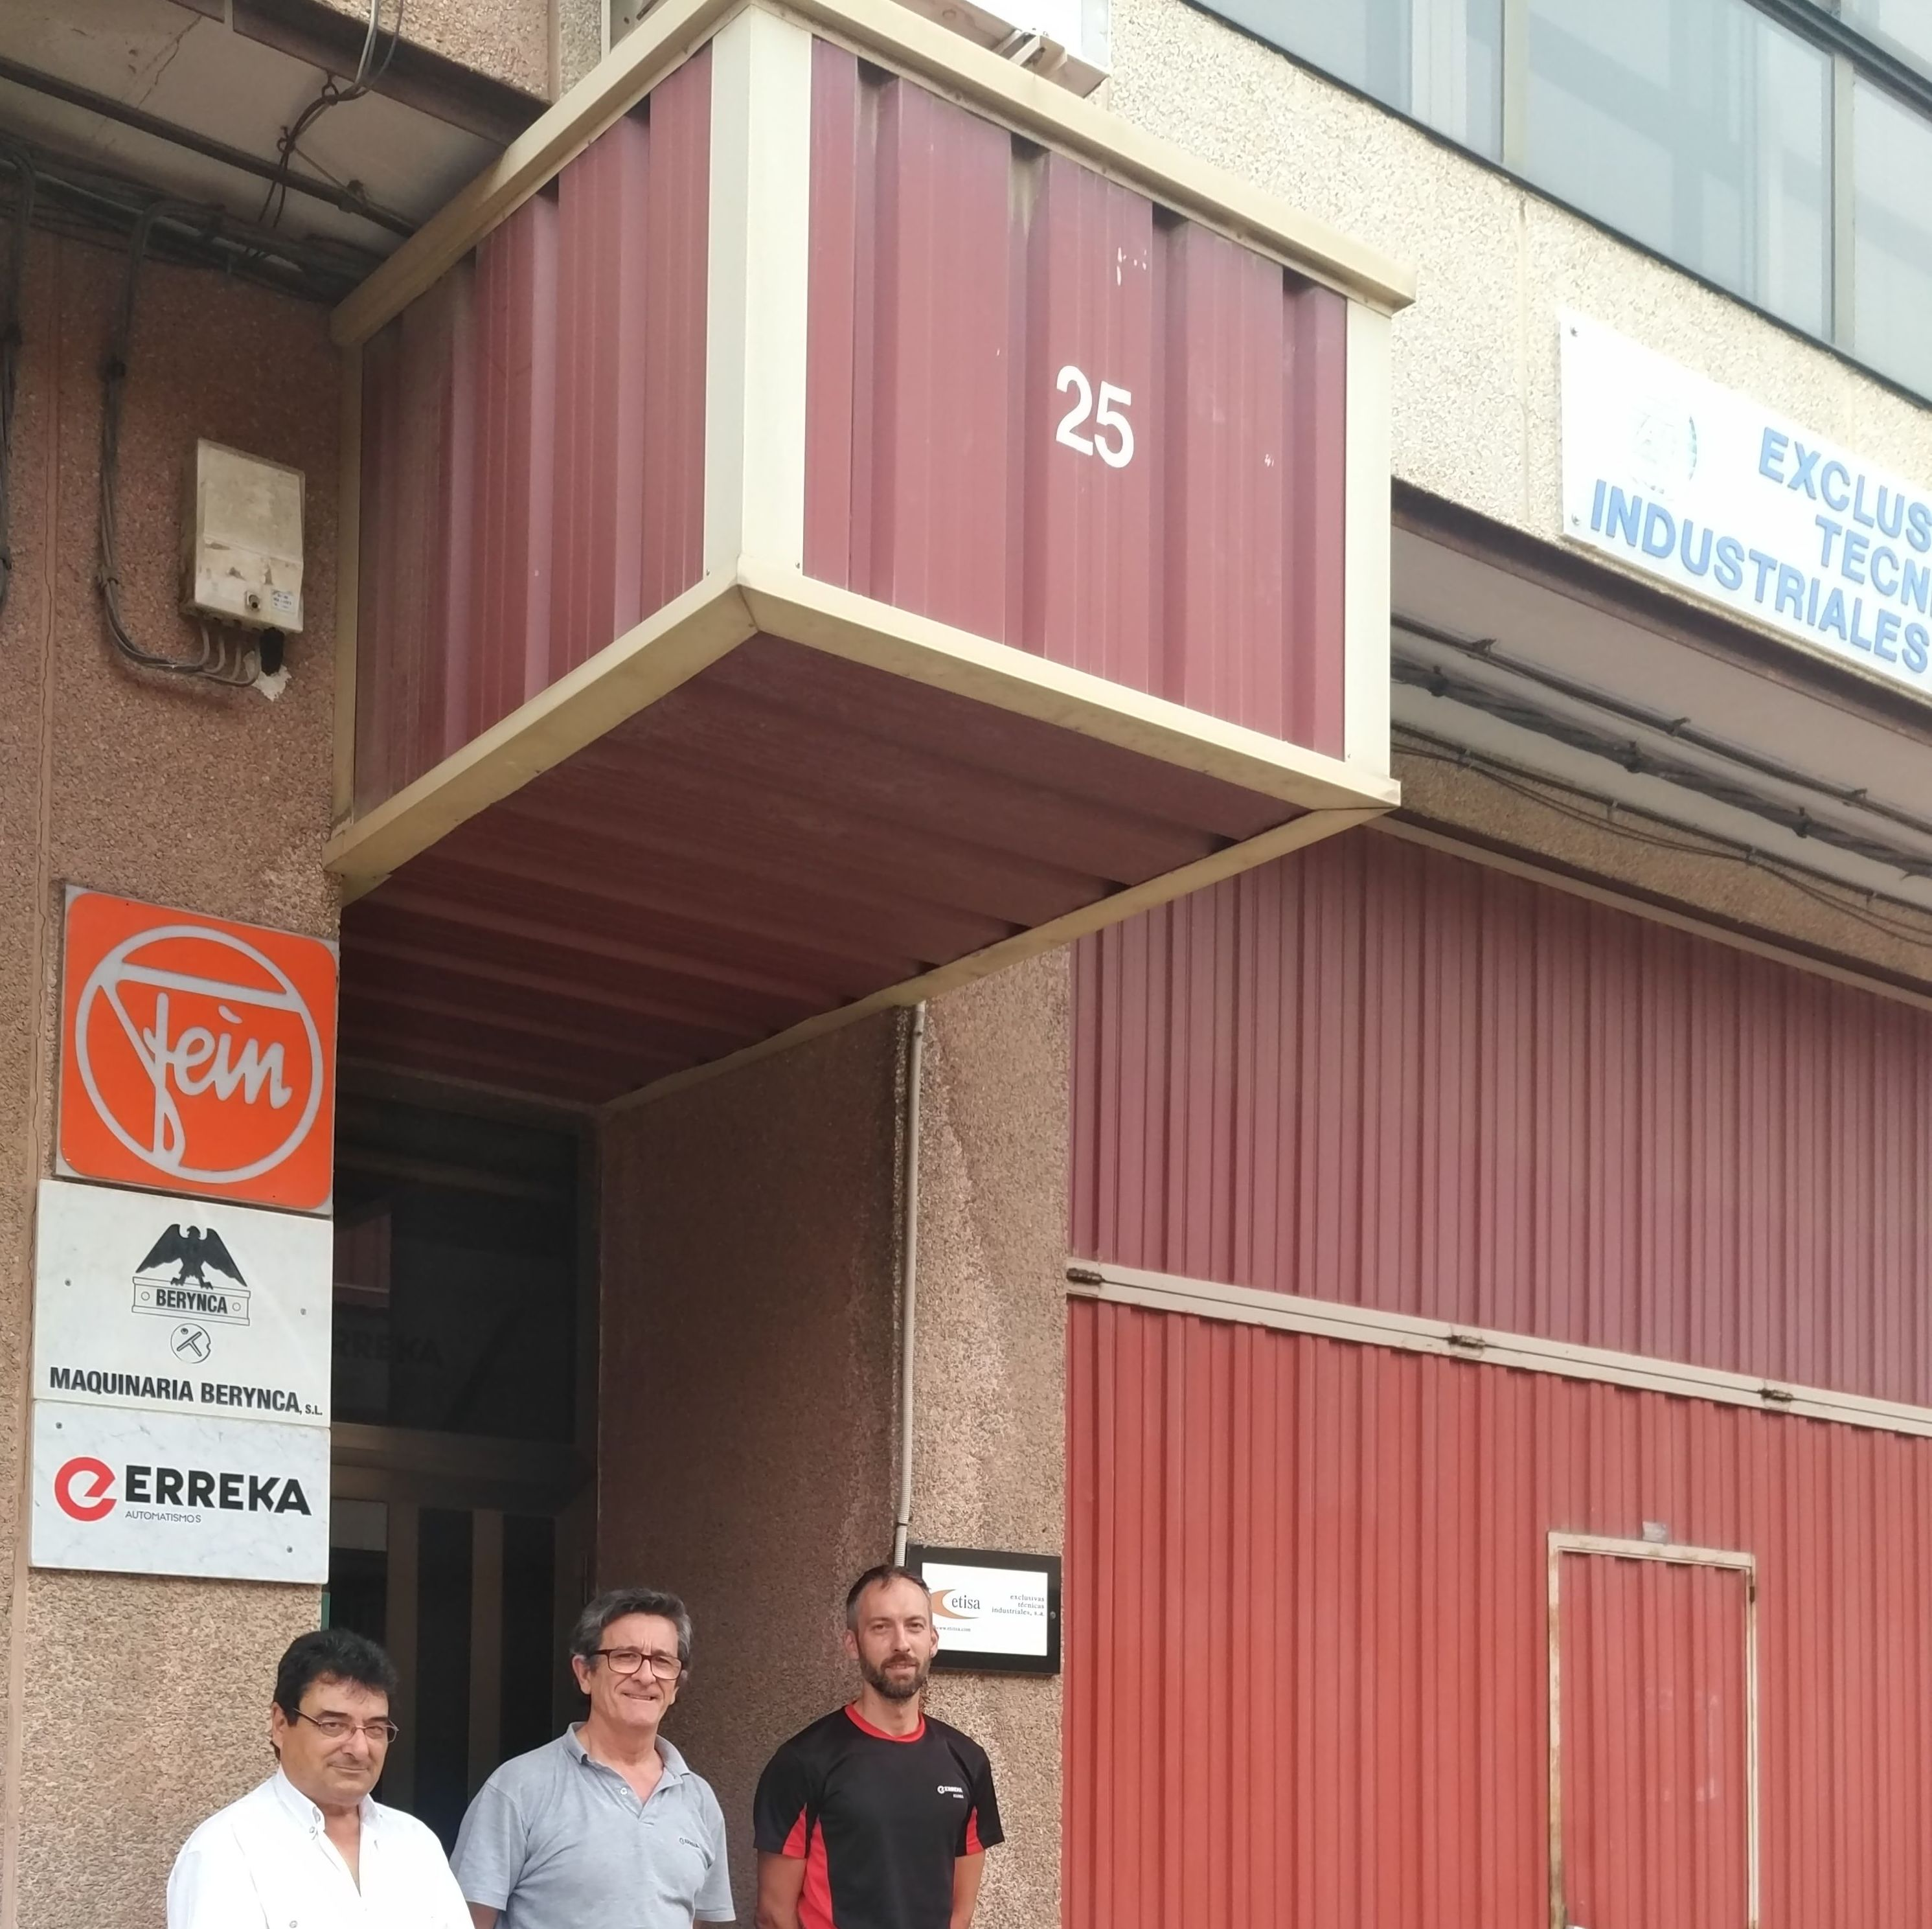 Foto 2 de Suministros industriales en Zaragoza | E.T.I.S.A. Exclusivas Técnicas Industriales, S.A.